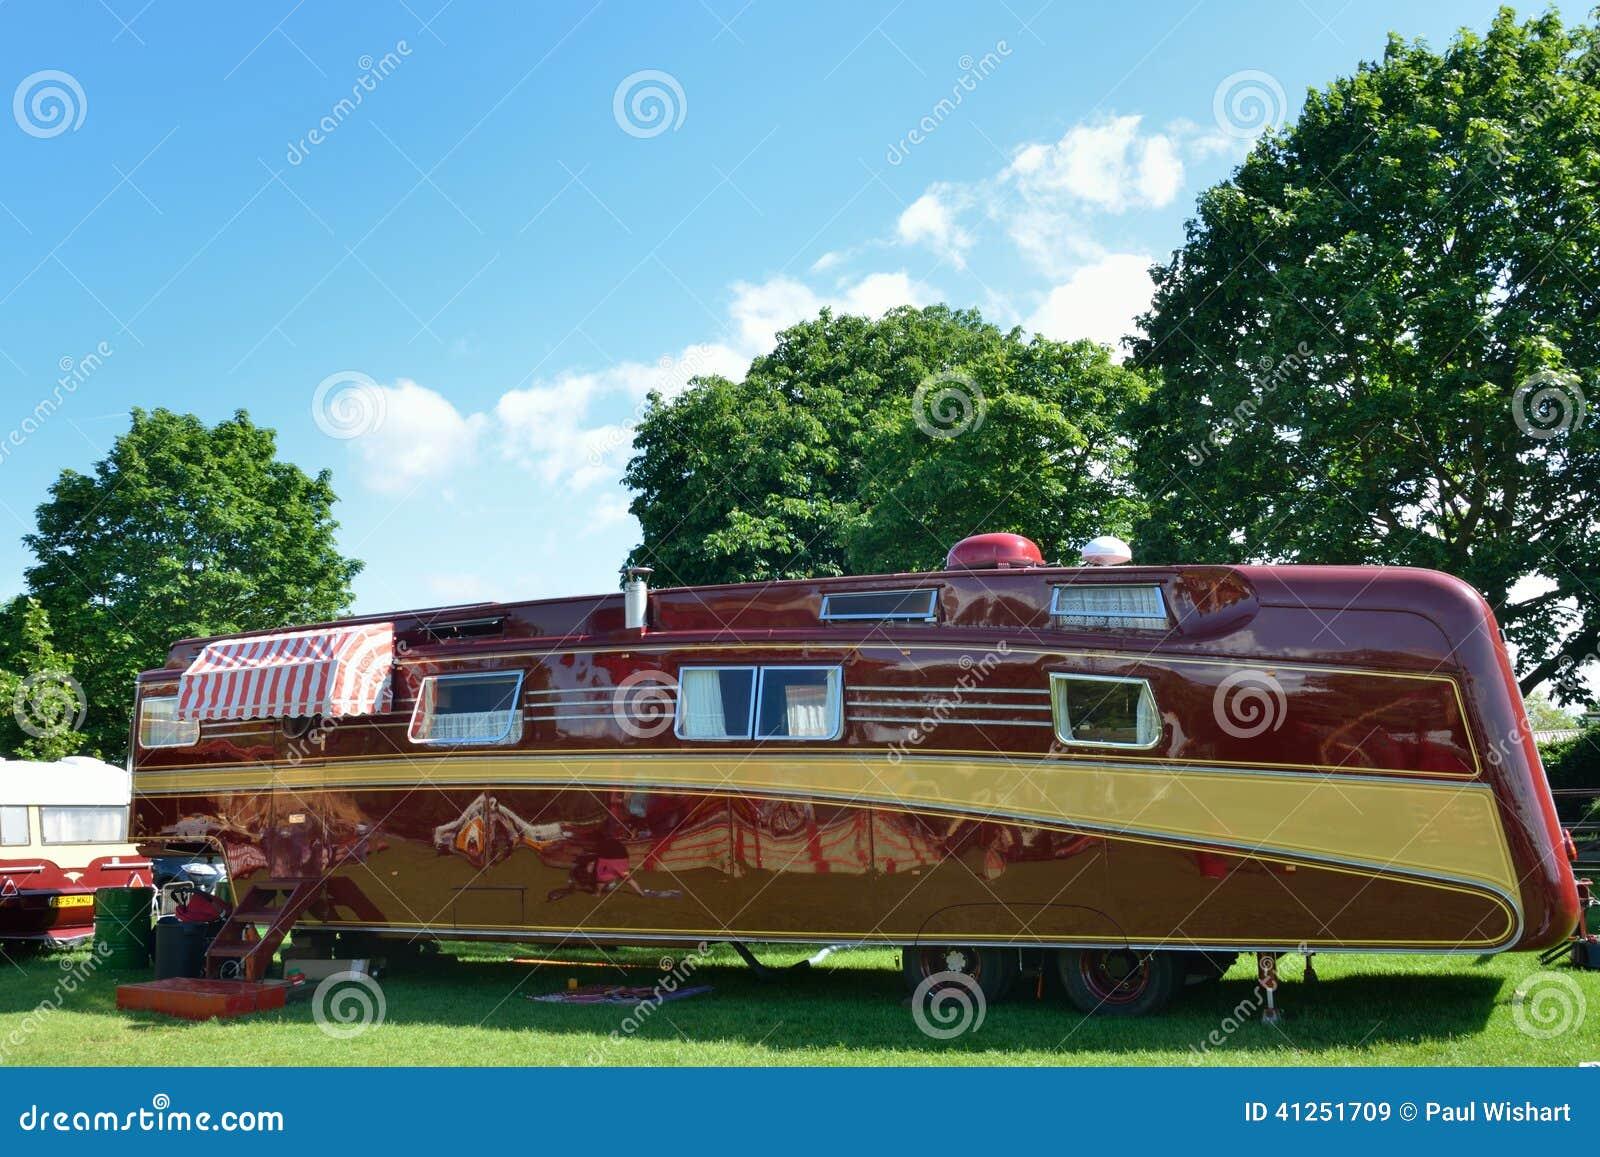 caravane de luxe tr s grande photo stock image 41251709. Black Bedroom Furniture Sets. Home Design Ideas